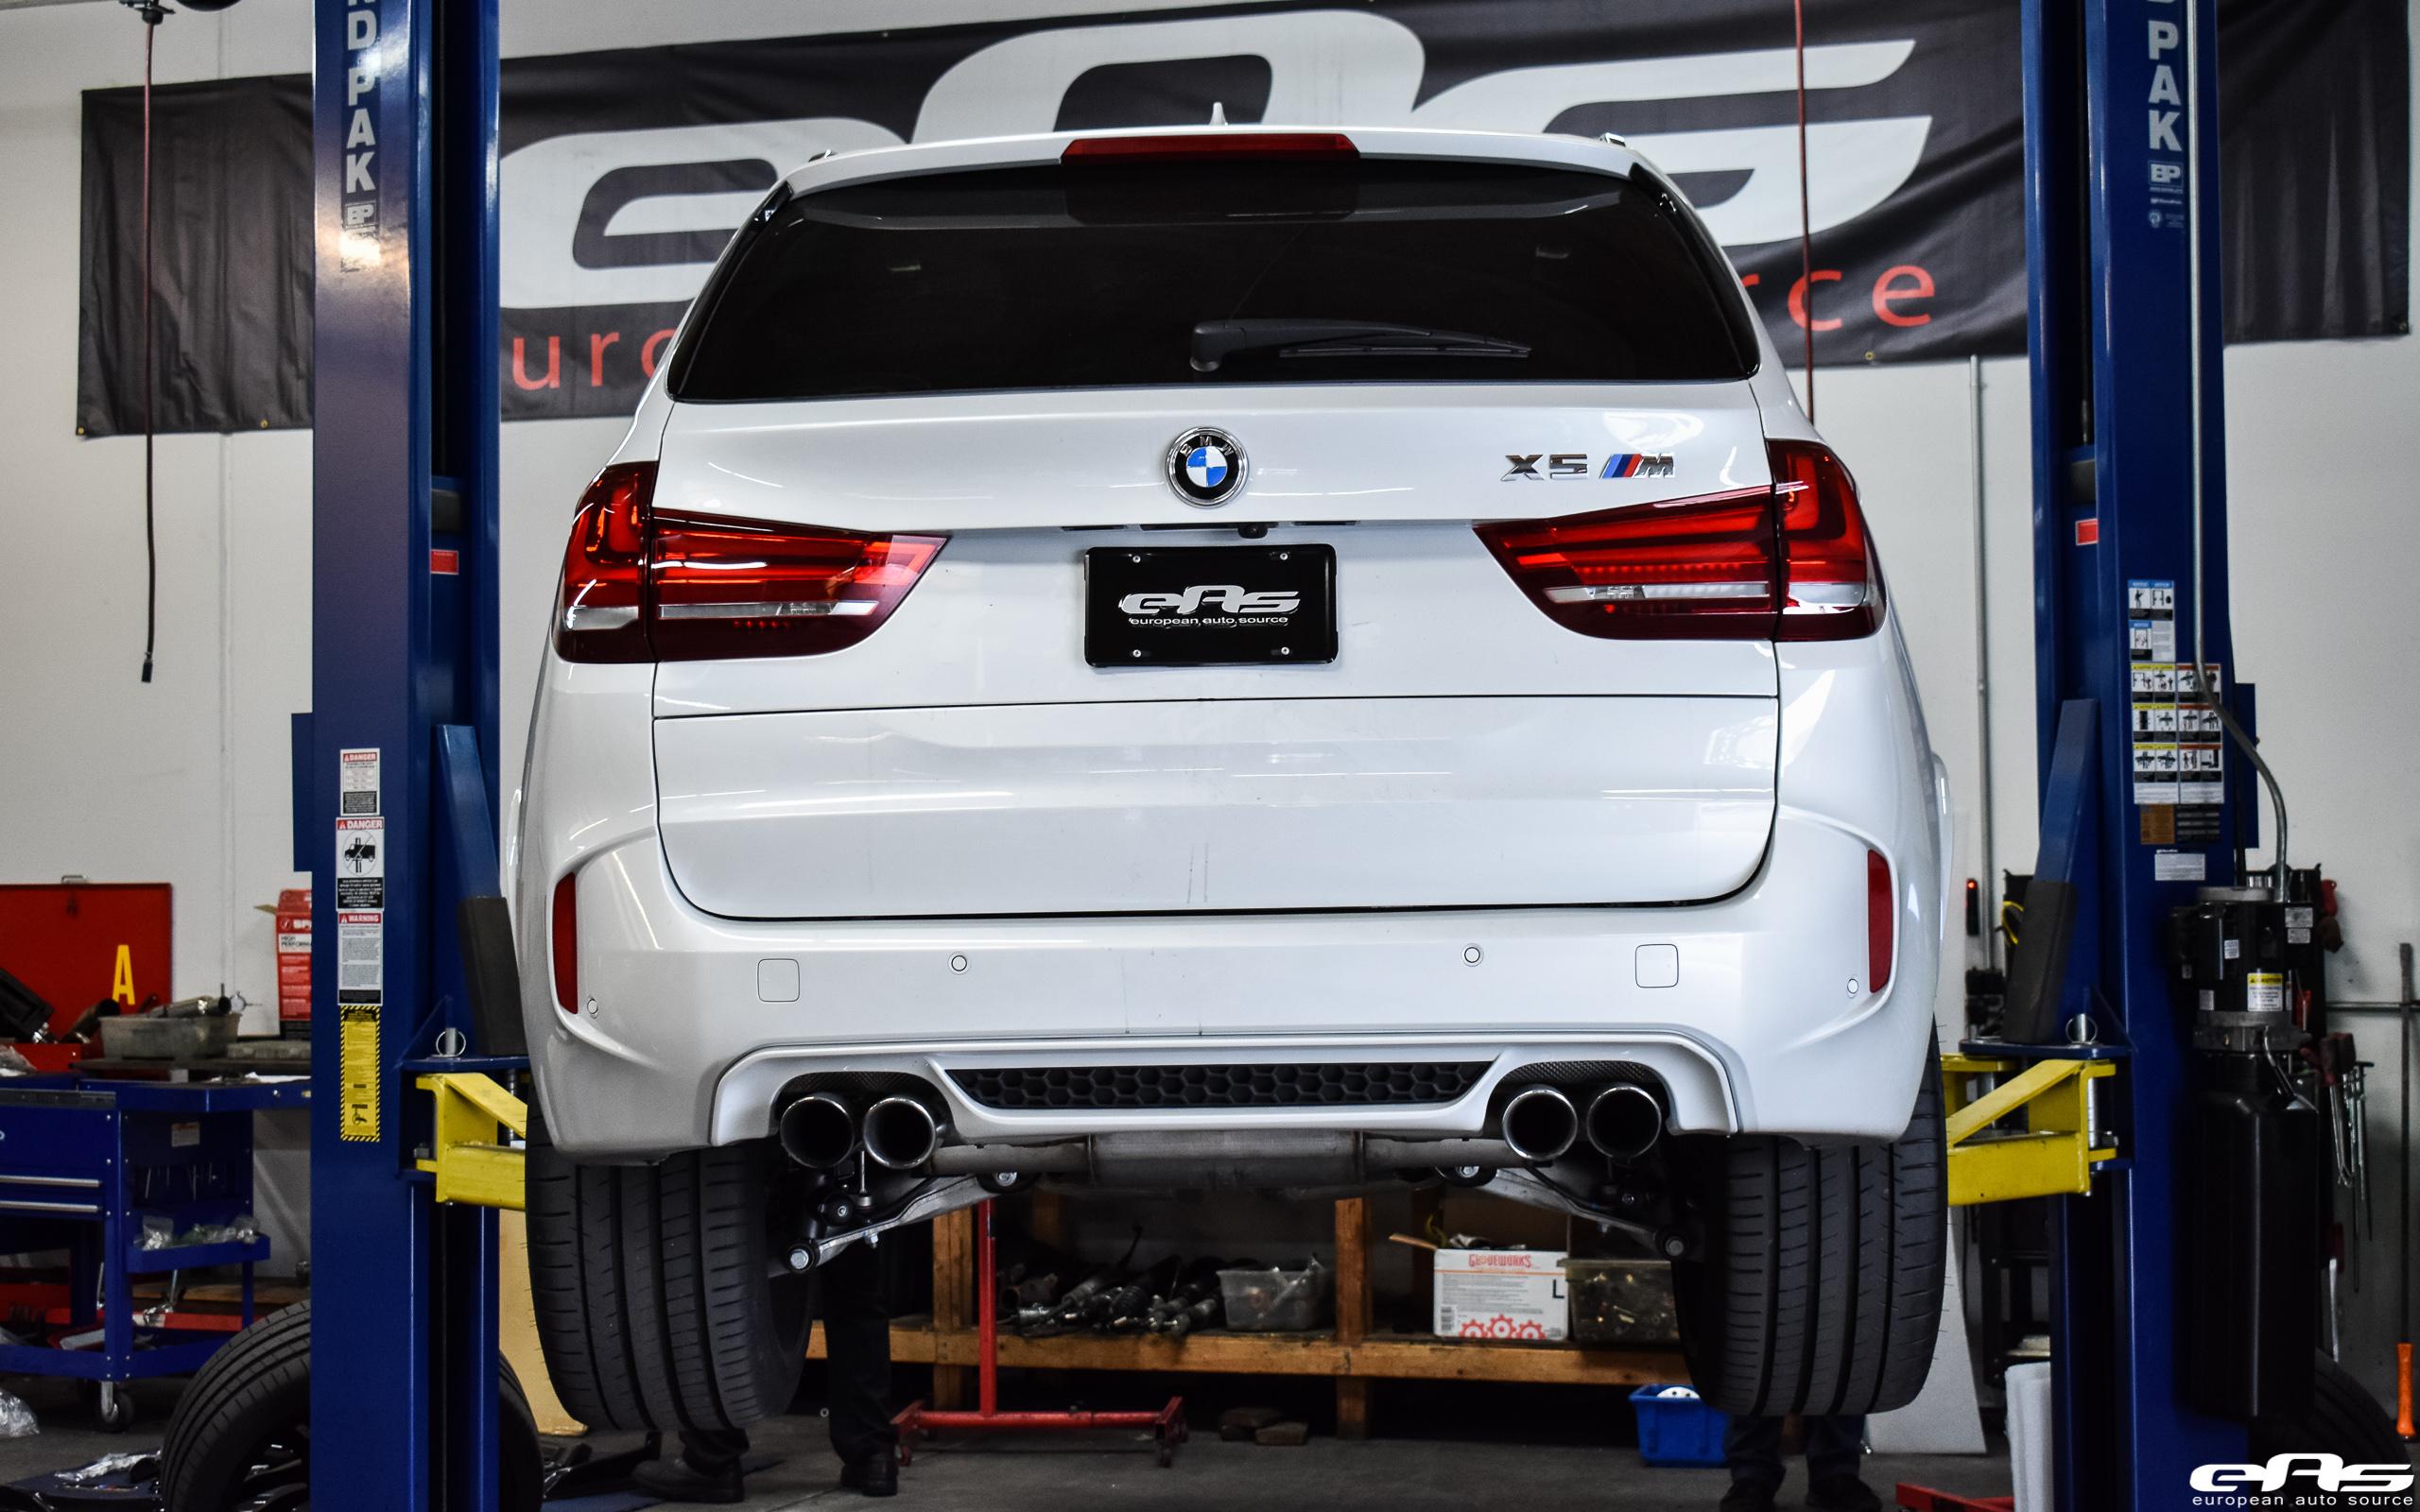 2014 5 bmw x5 m amp x6 m f85 f86 page 5 - Ind M Performance Side Grille Set Ind Painted Front Reflector Set Ind Painted Trunk Roundel Trim Rkp Carbon Fiber Bumper Inserts